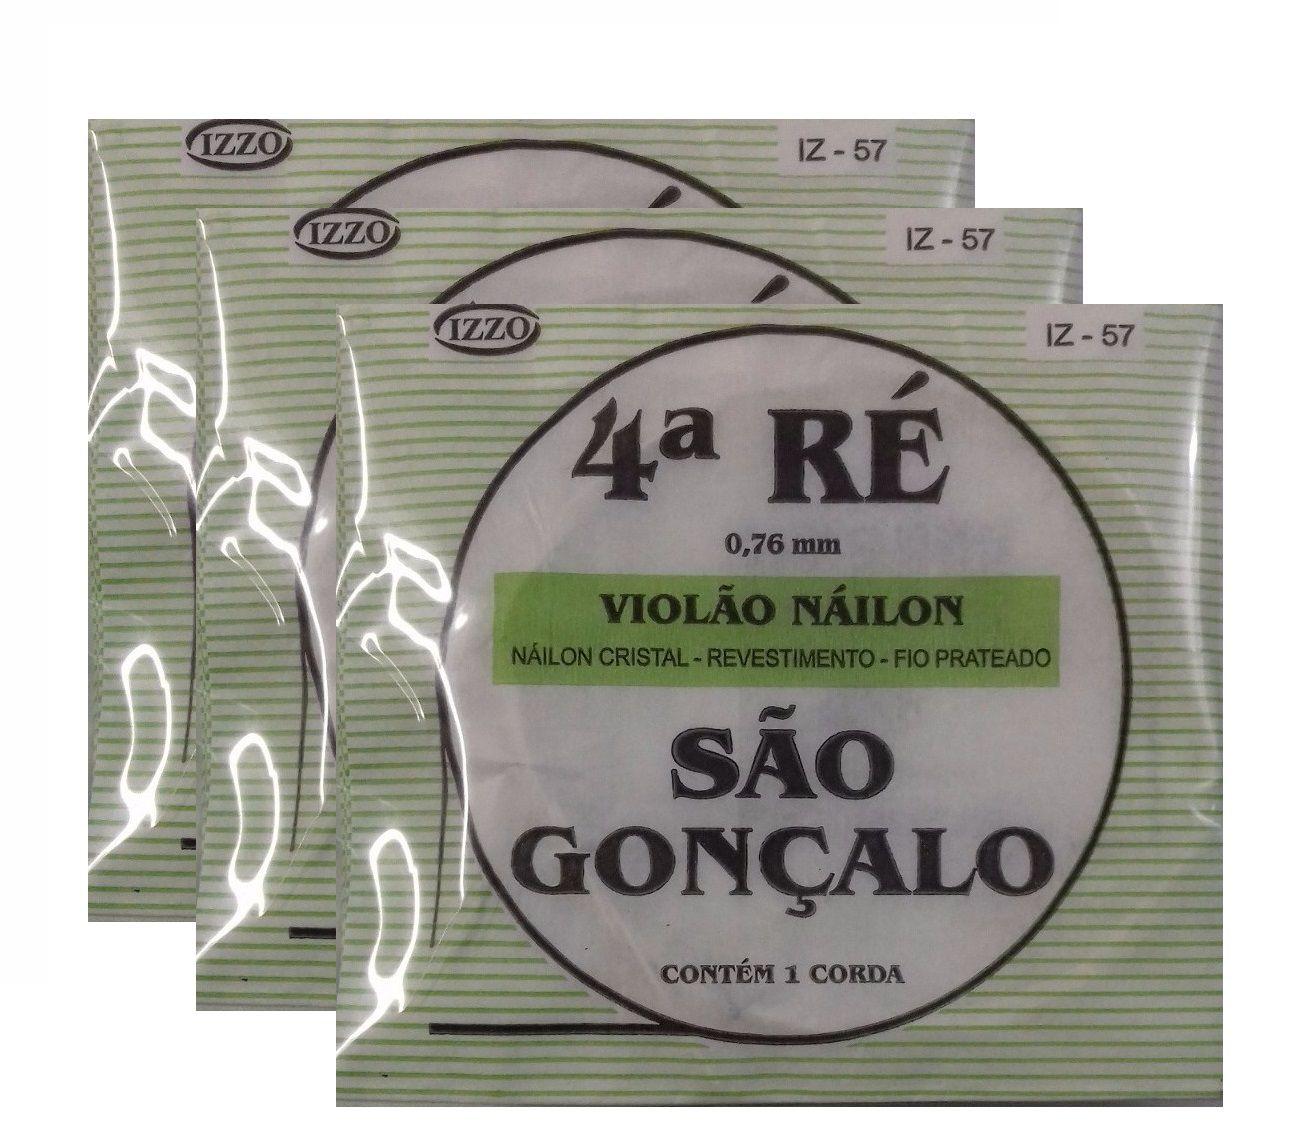 Kit 3 Cordas Nylon Cristal 4 Quarta Ré São Gonçalo 57